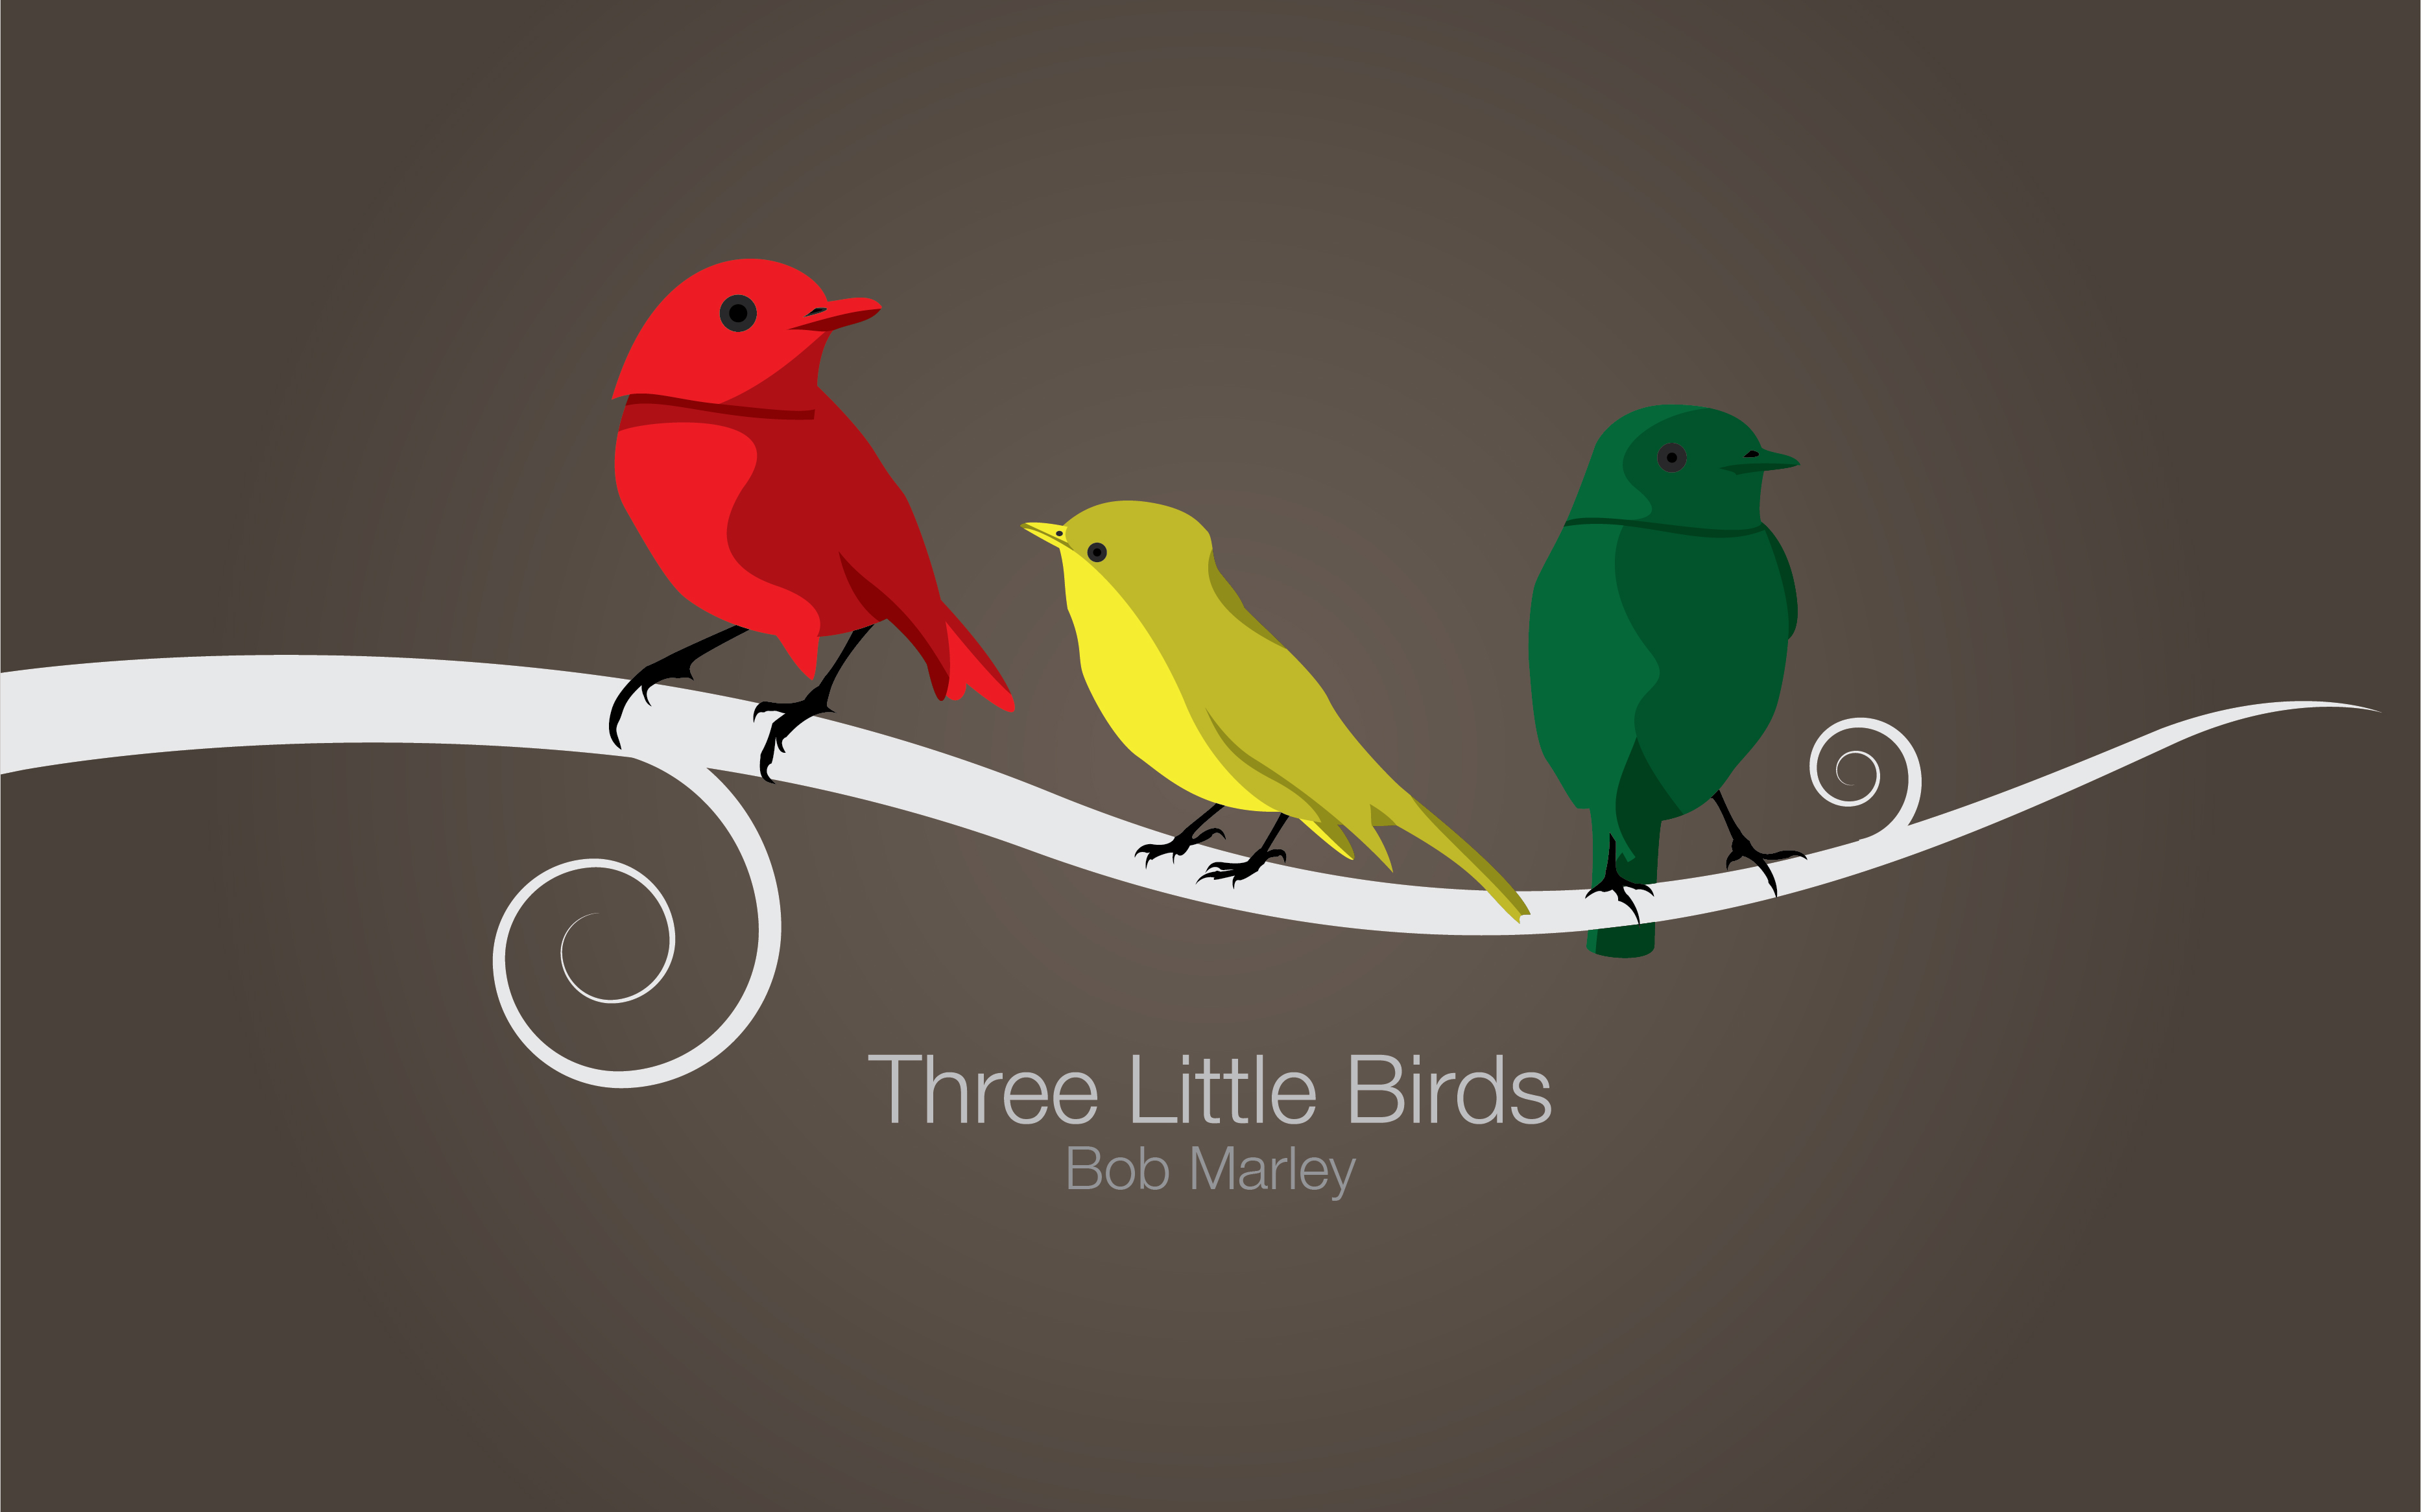 three little birds by ozztheswede on deviantart